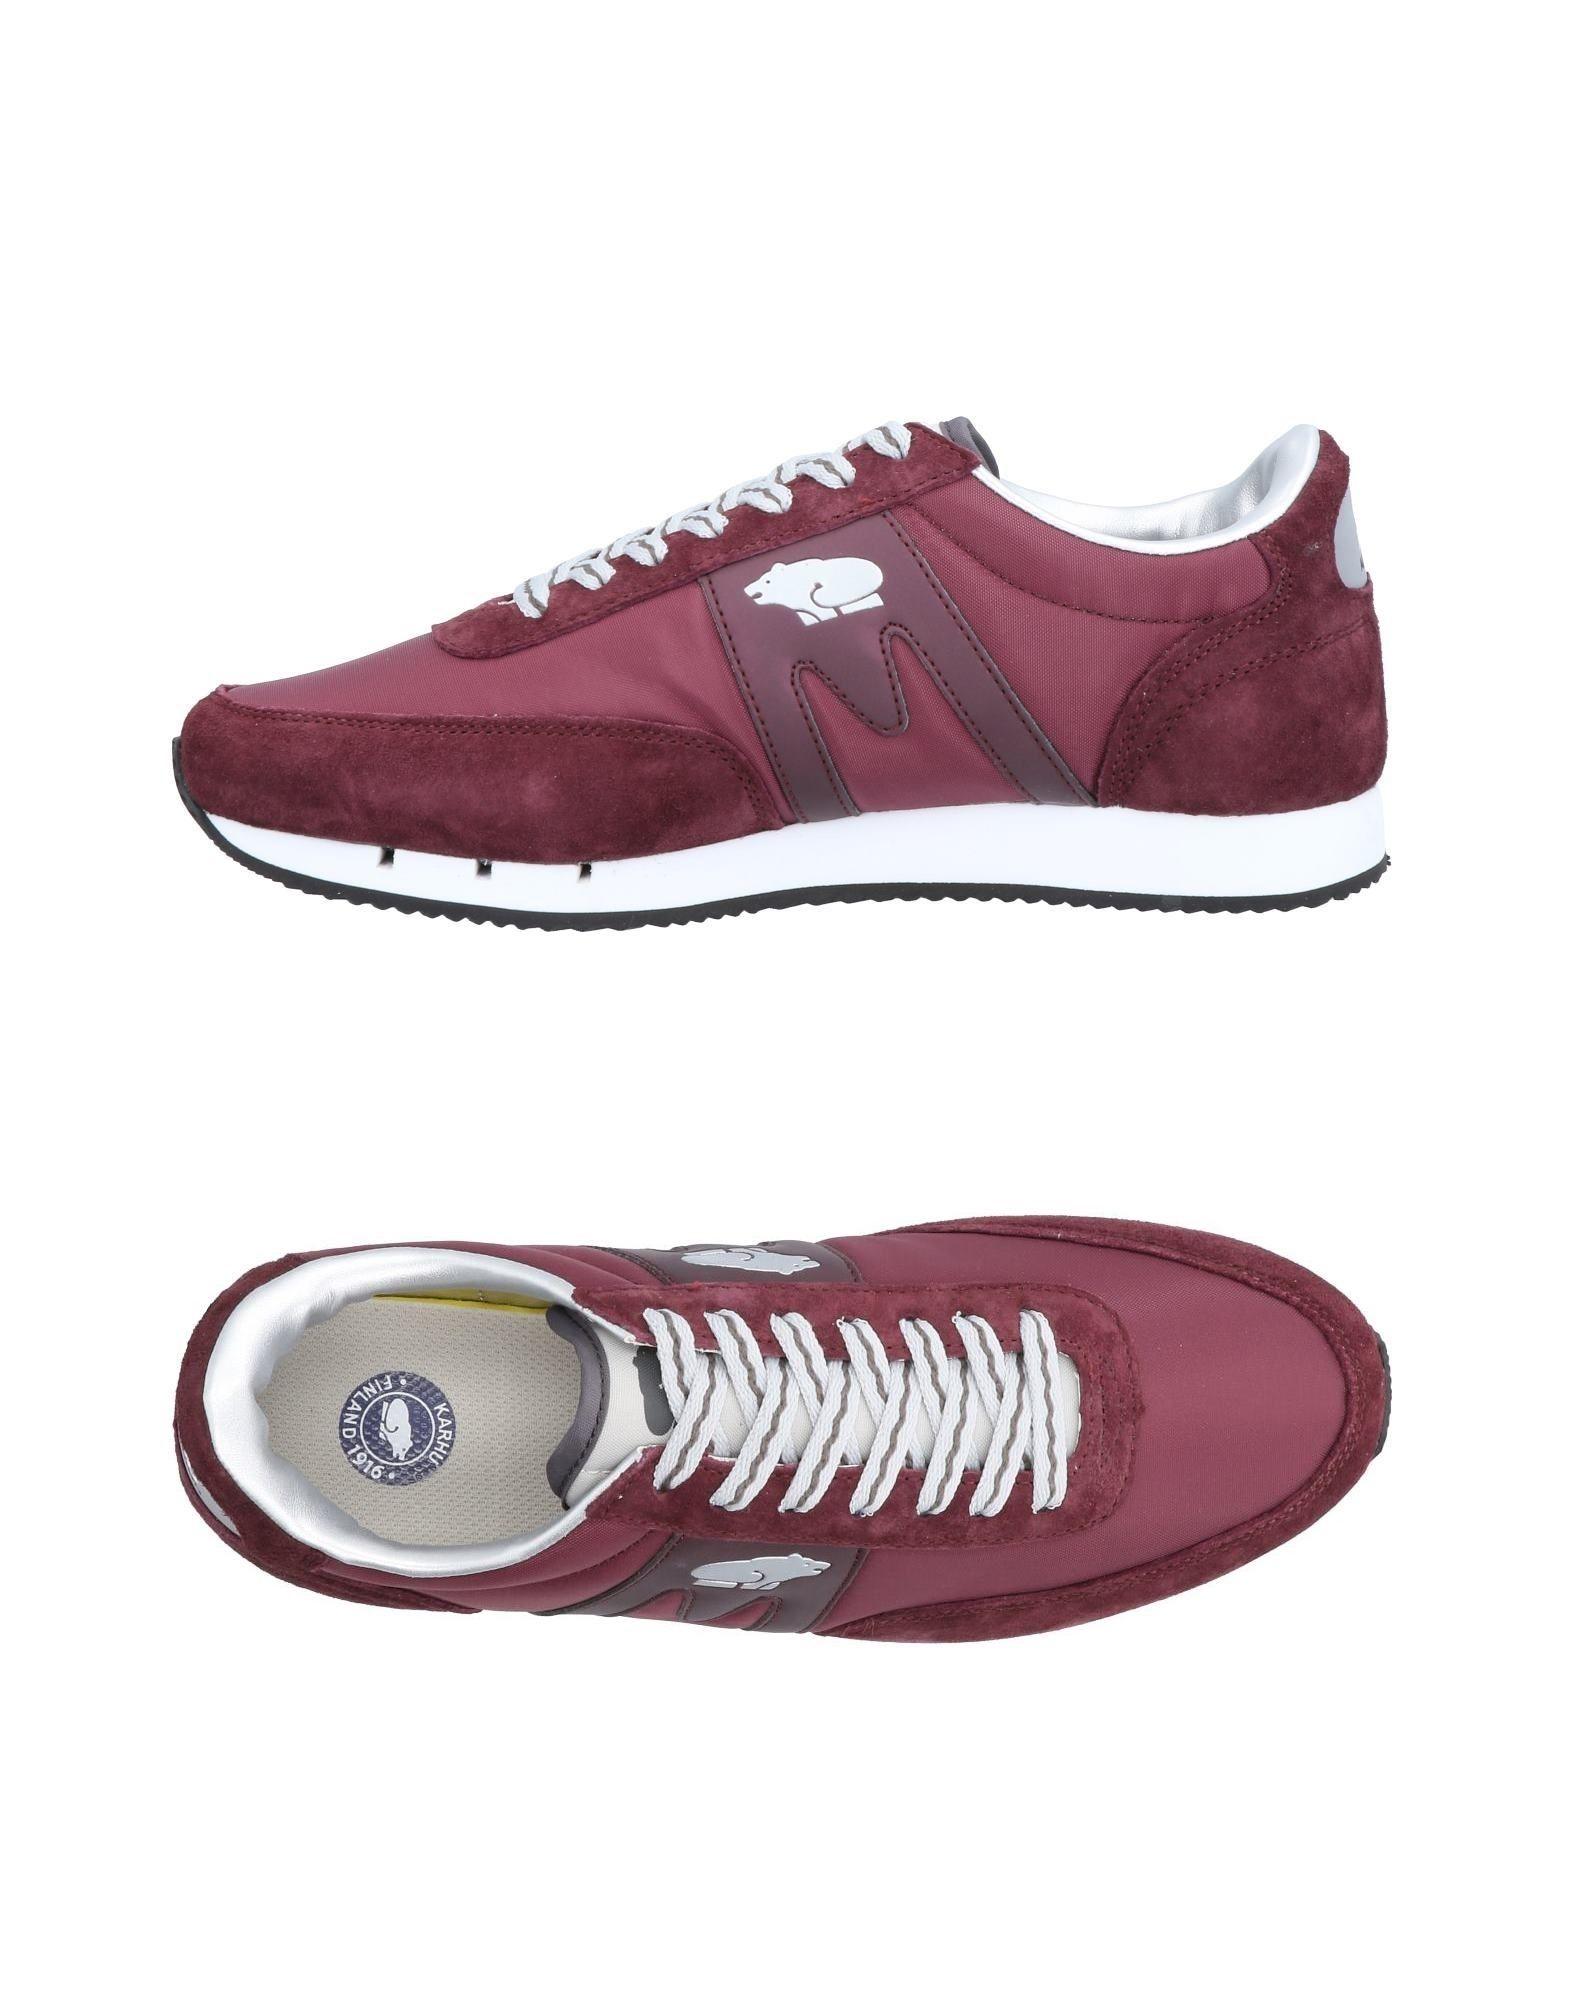 Moda Sneakers Karhu Uomo - 11496521JD